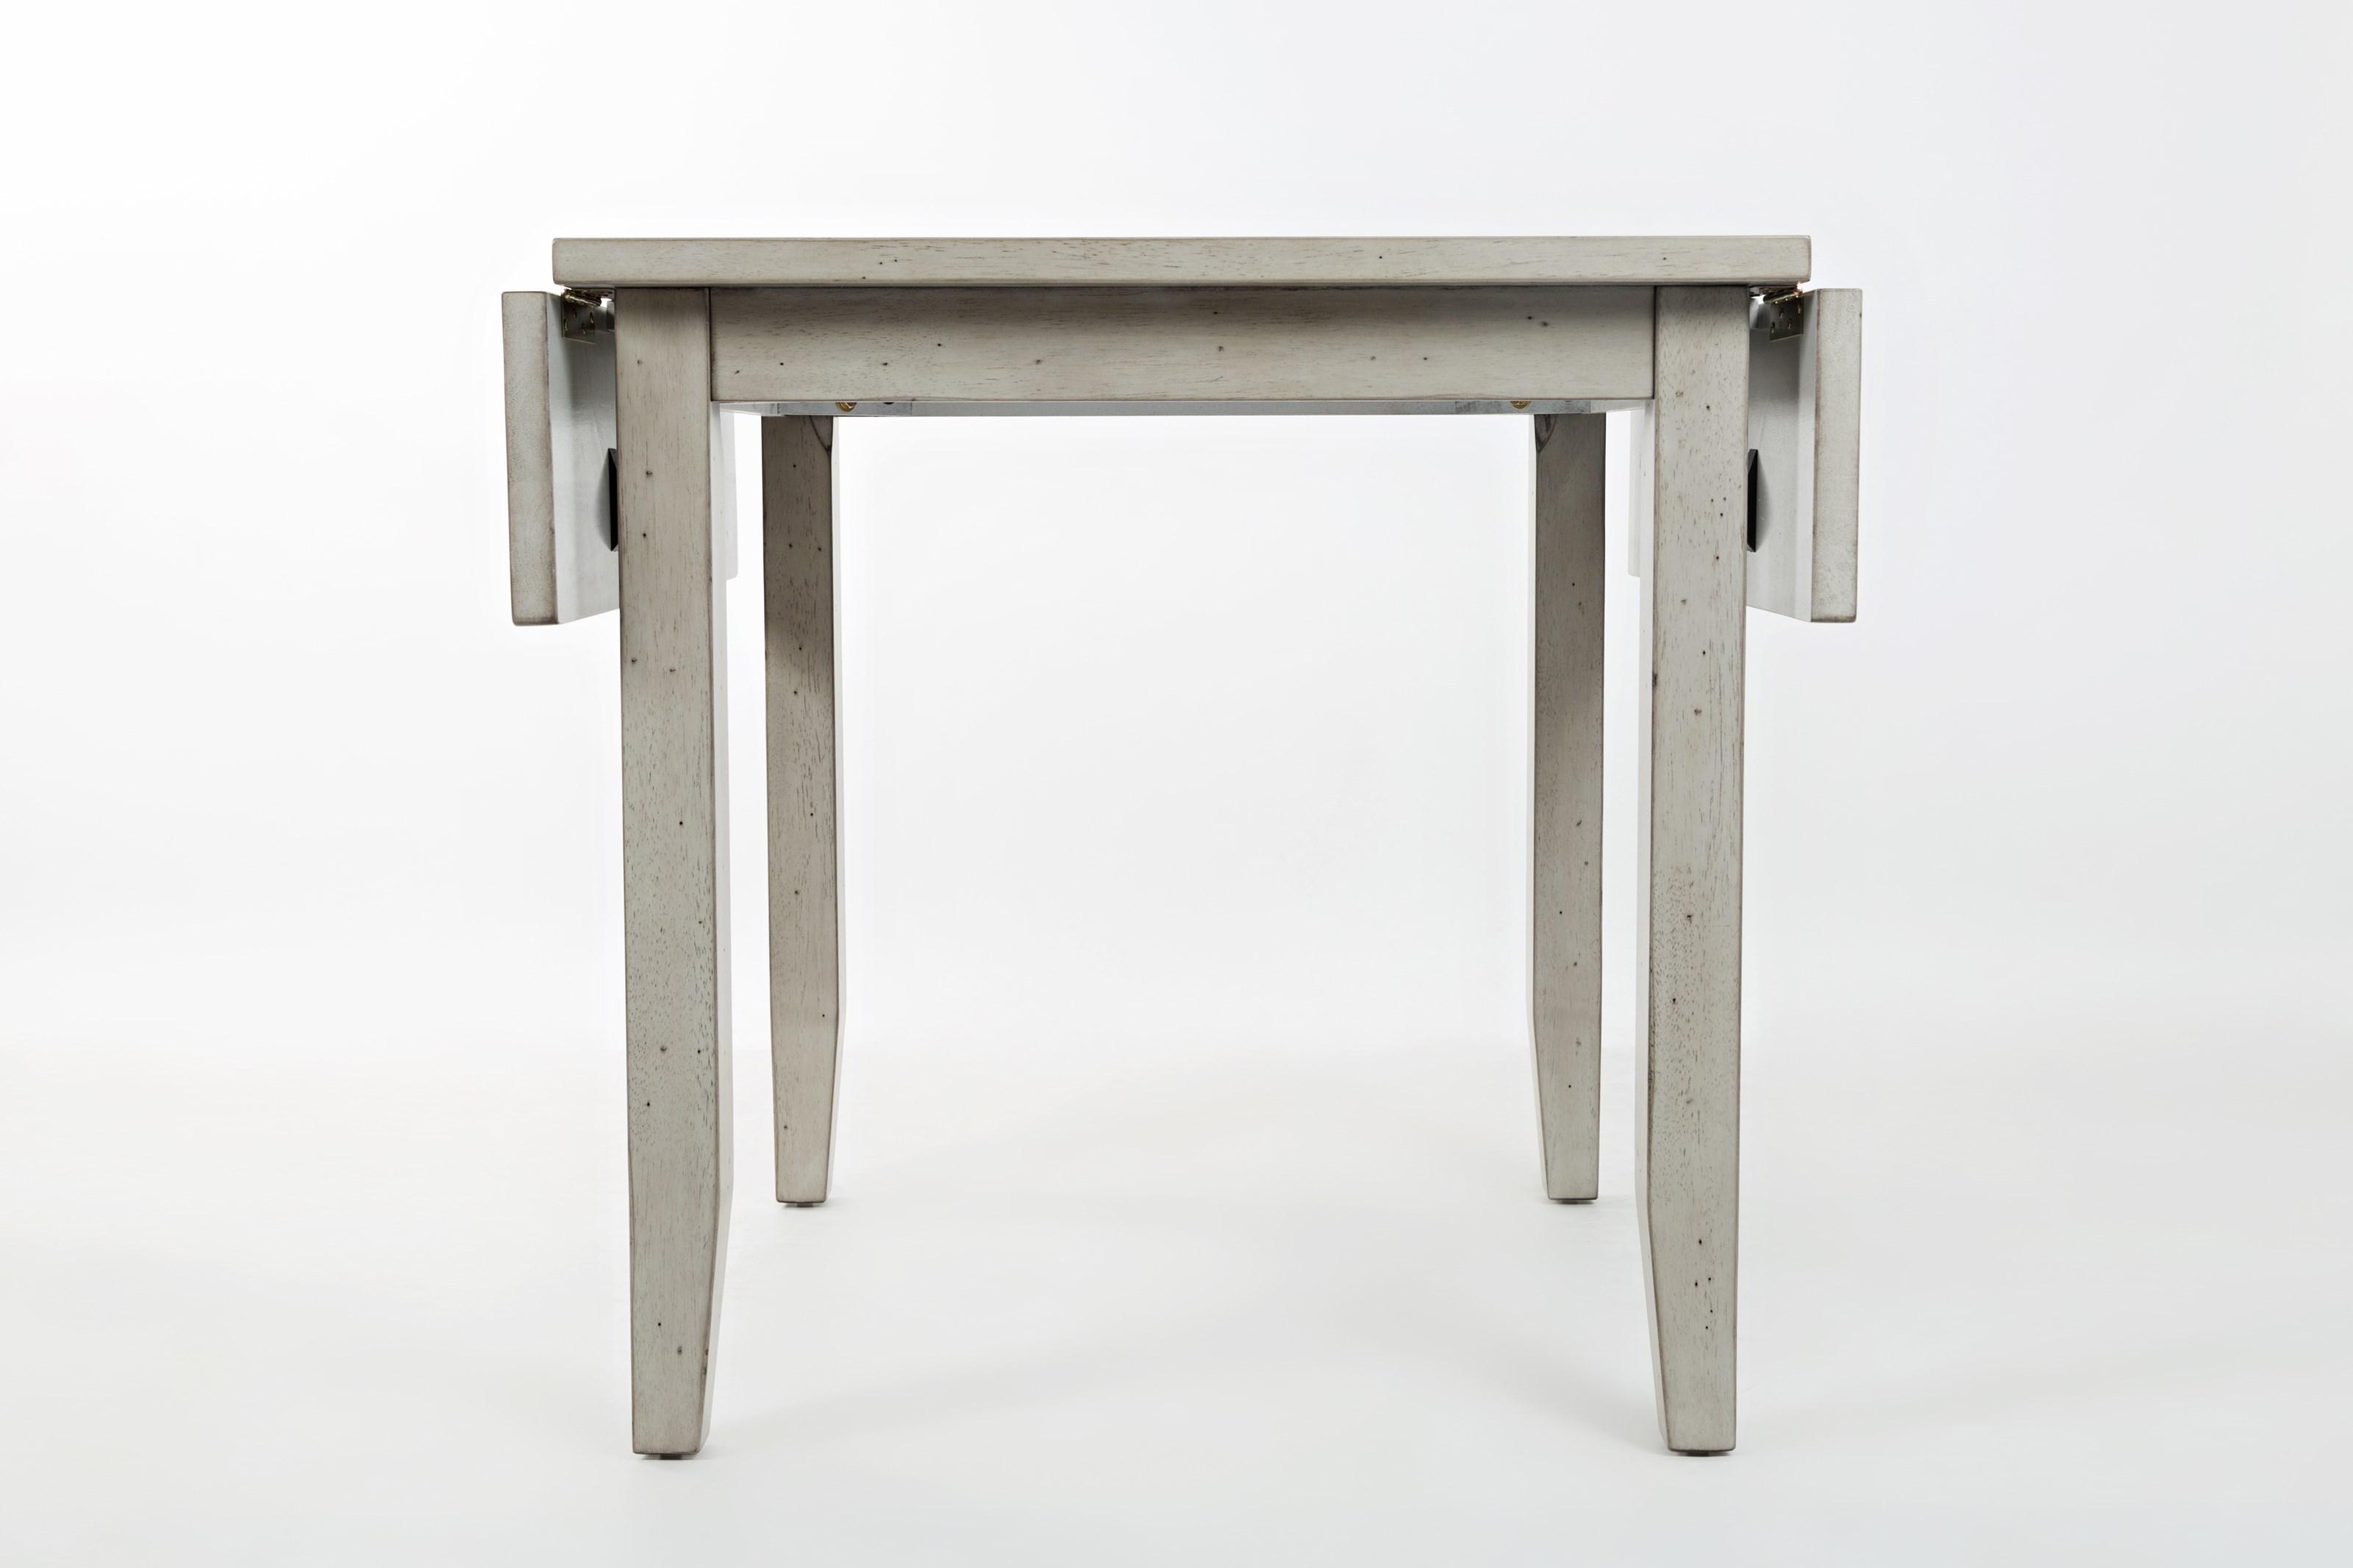 Sarasota Springs Table by Jofran at HomeWorld Furniture